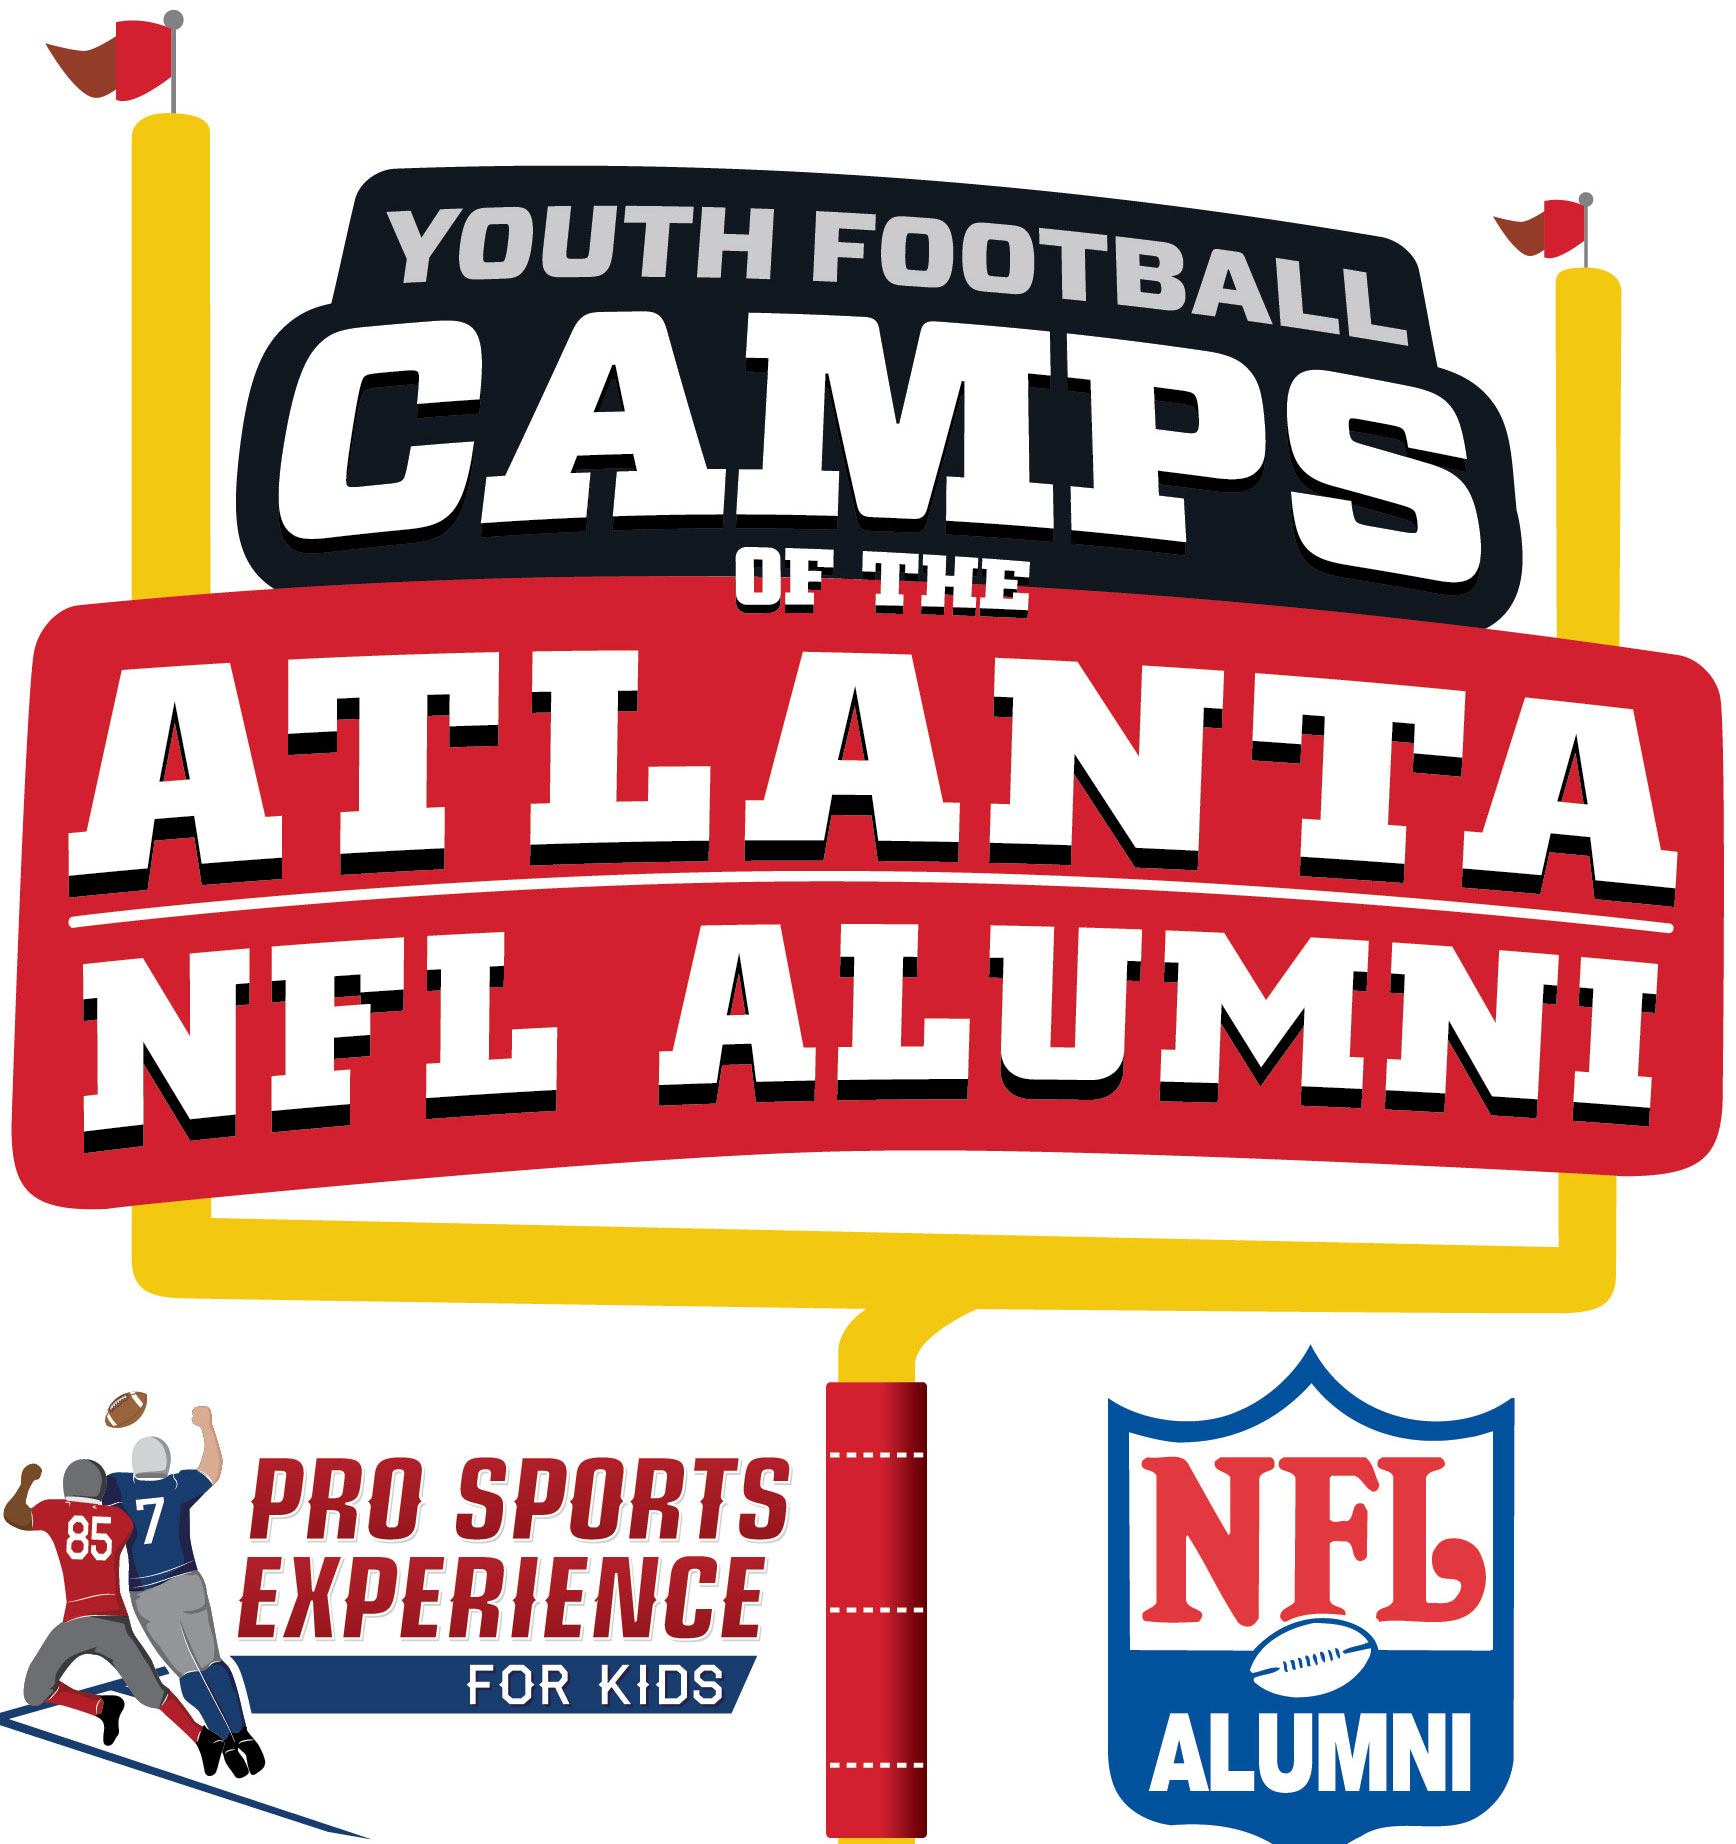 Atlanta NFL Alumni Hero Youth Football Camps - Atlanta